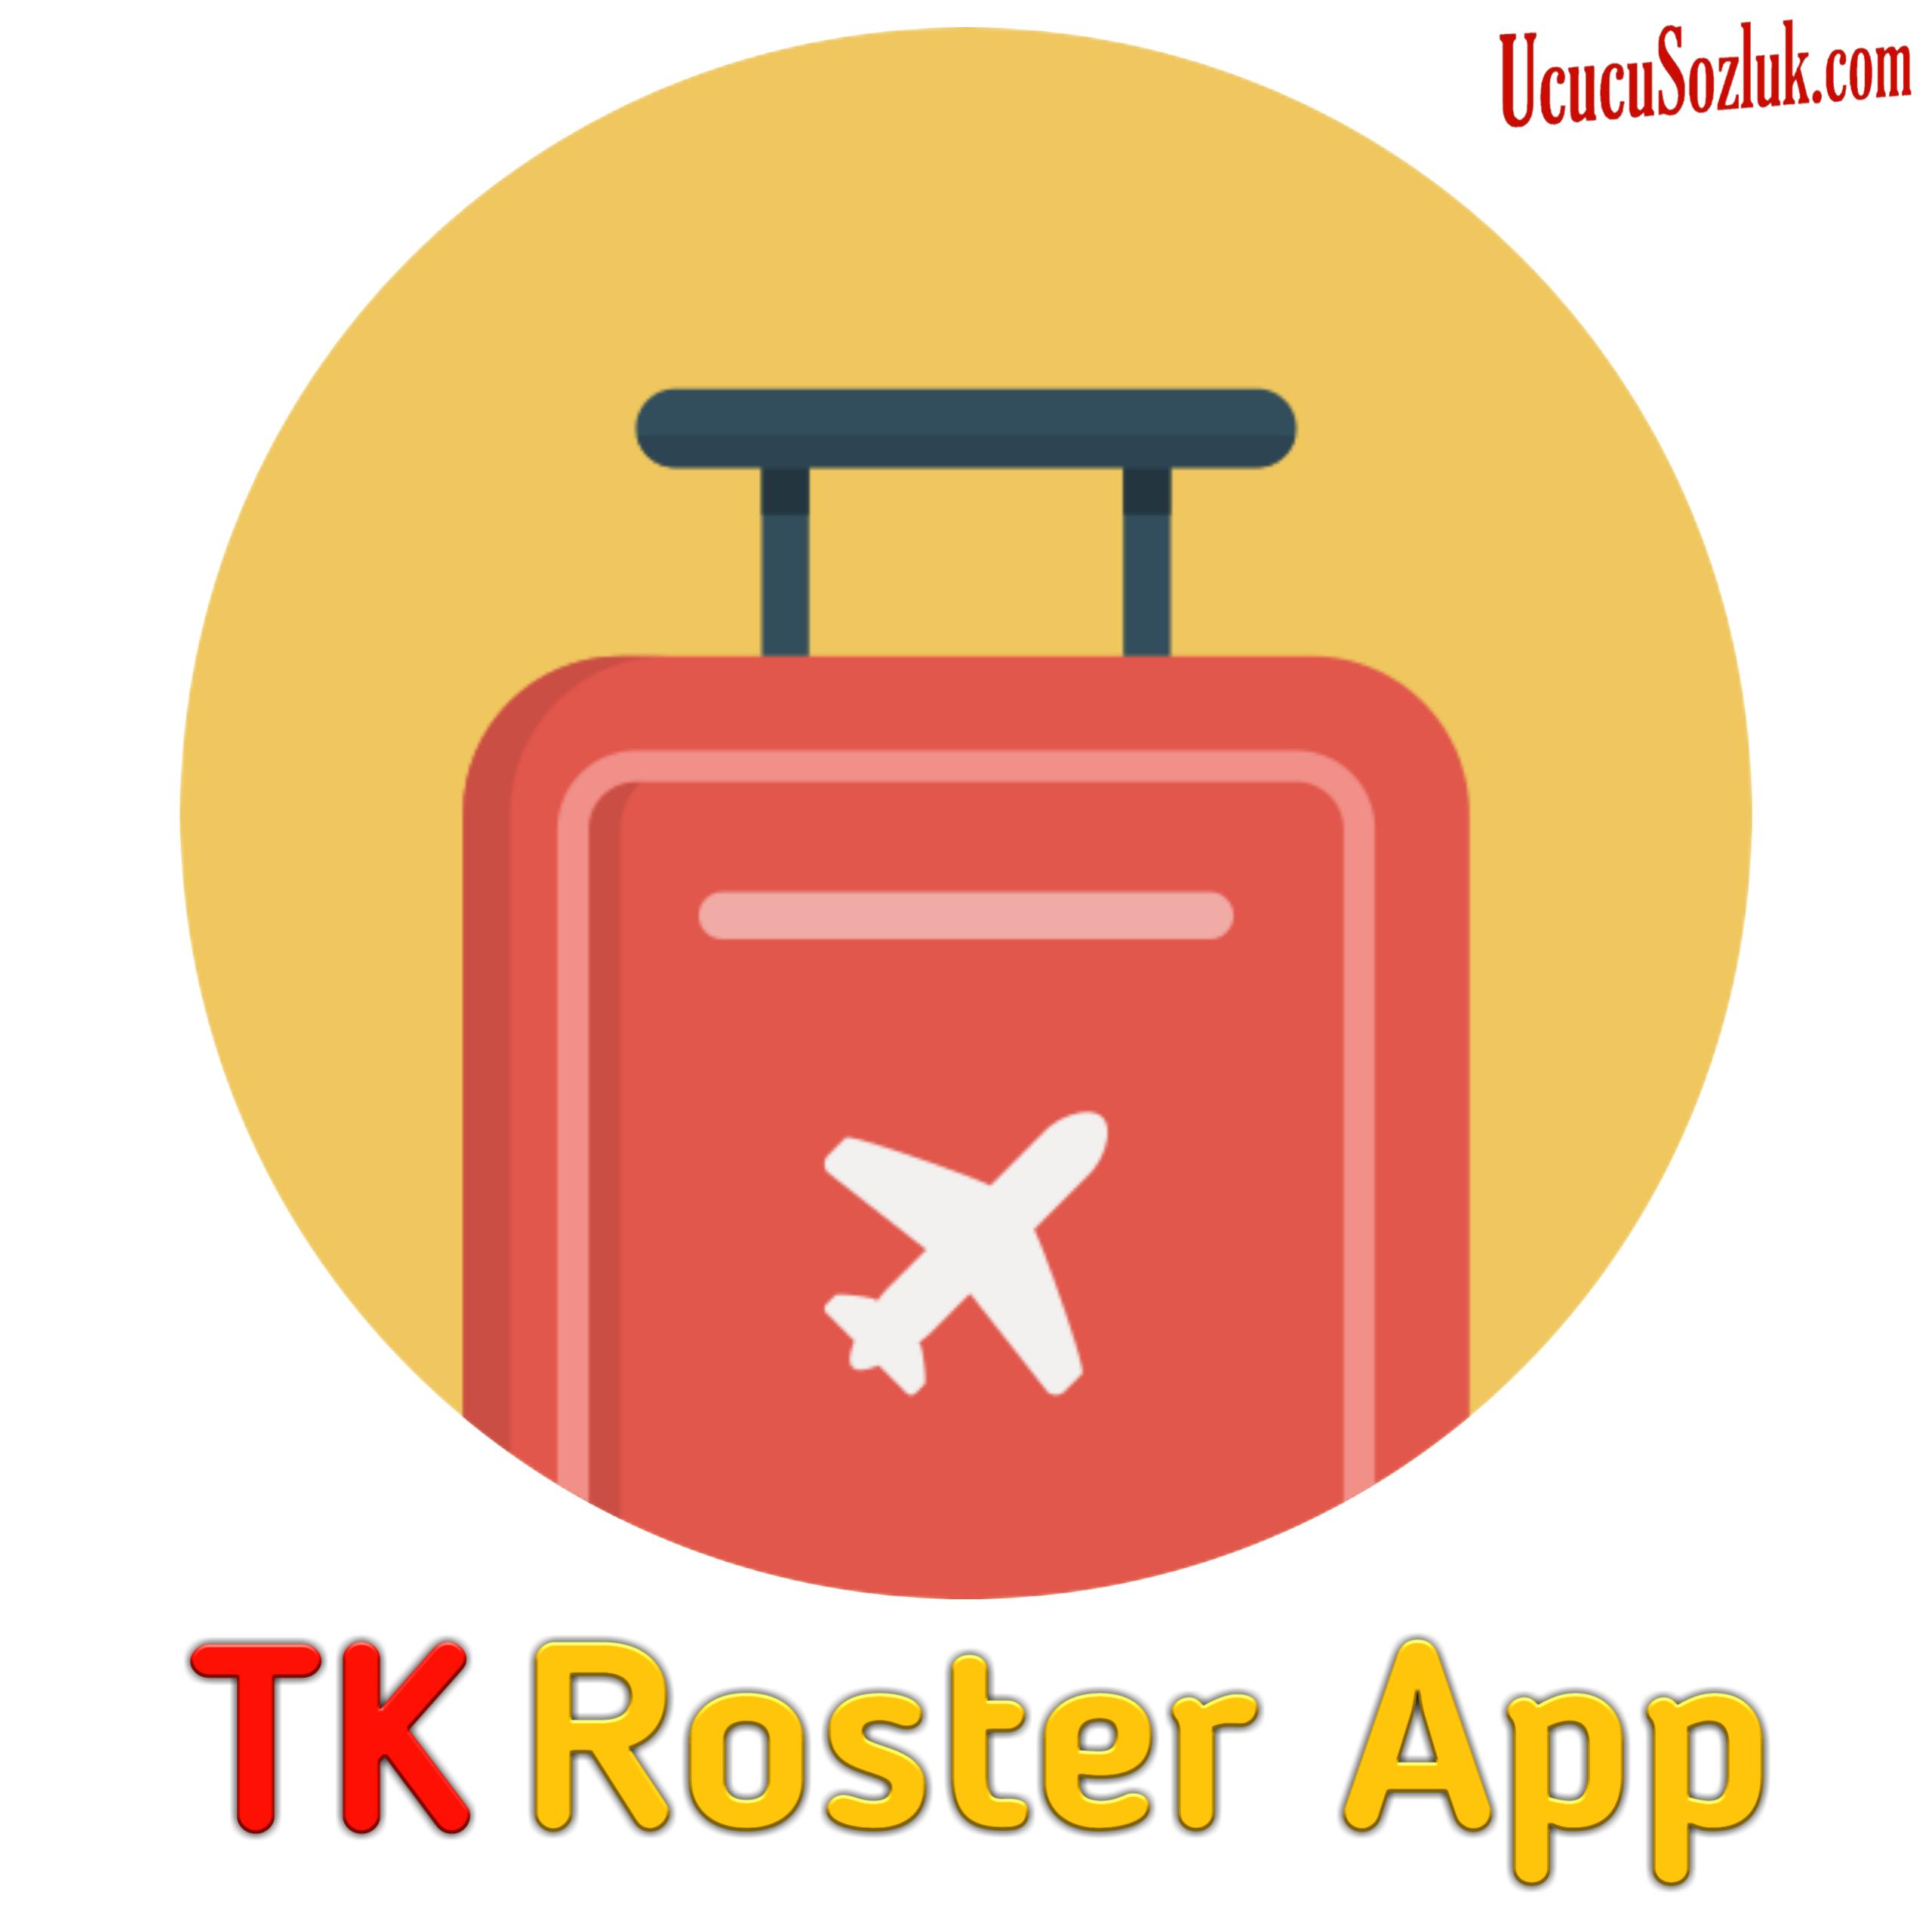 TK Roster App